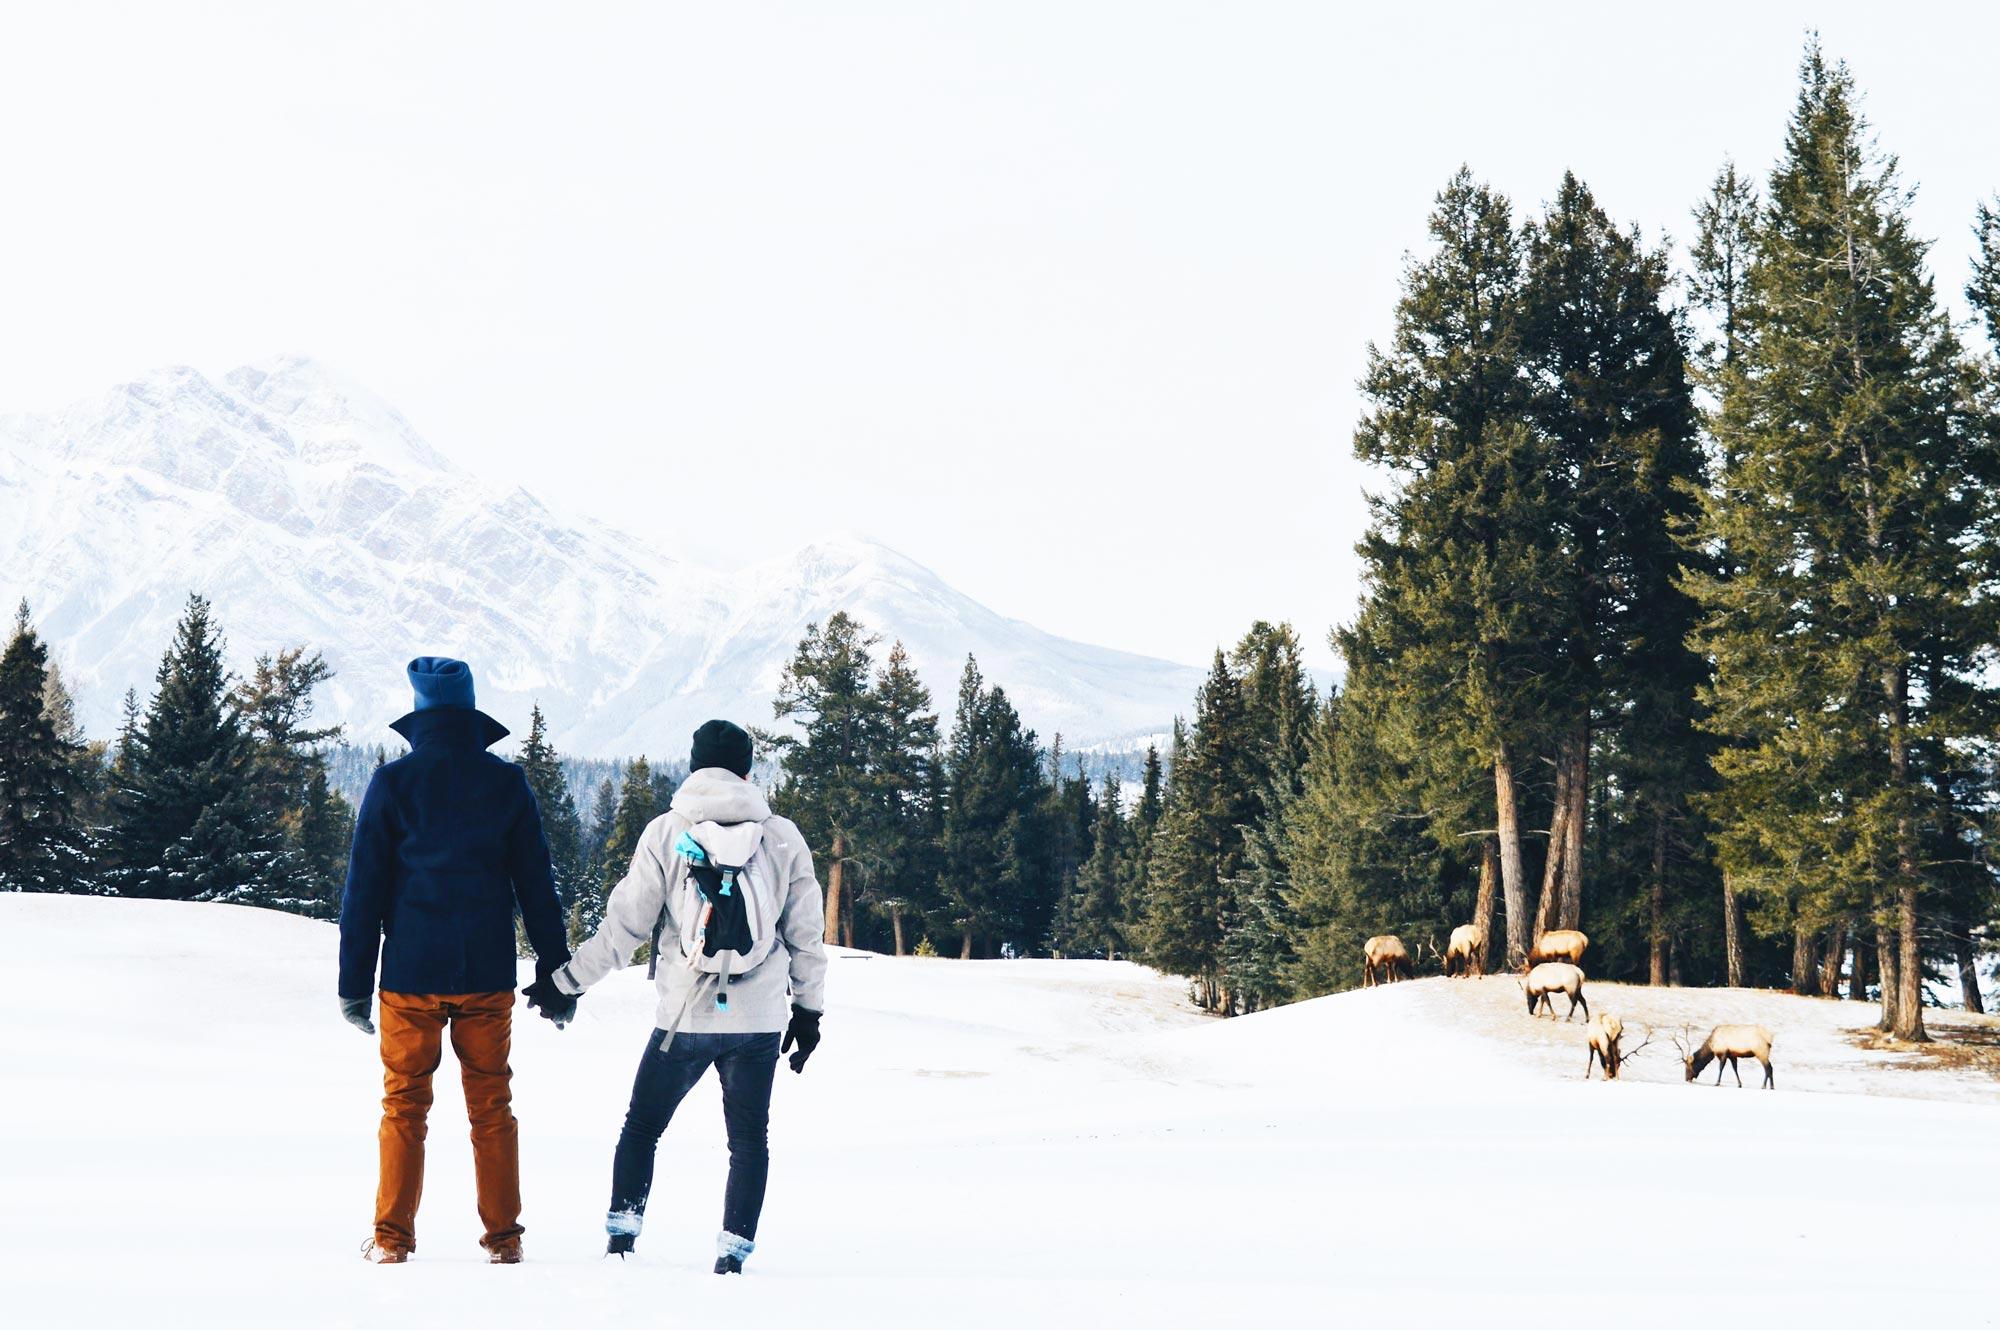 Gay Winter Trip to Canada: Road Trip to Jasper National Park Gay Winterreise Kanada Edmonton Jasper National Park © Coupleofmen.com